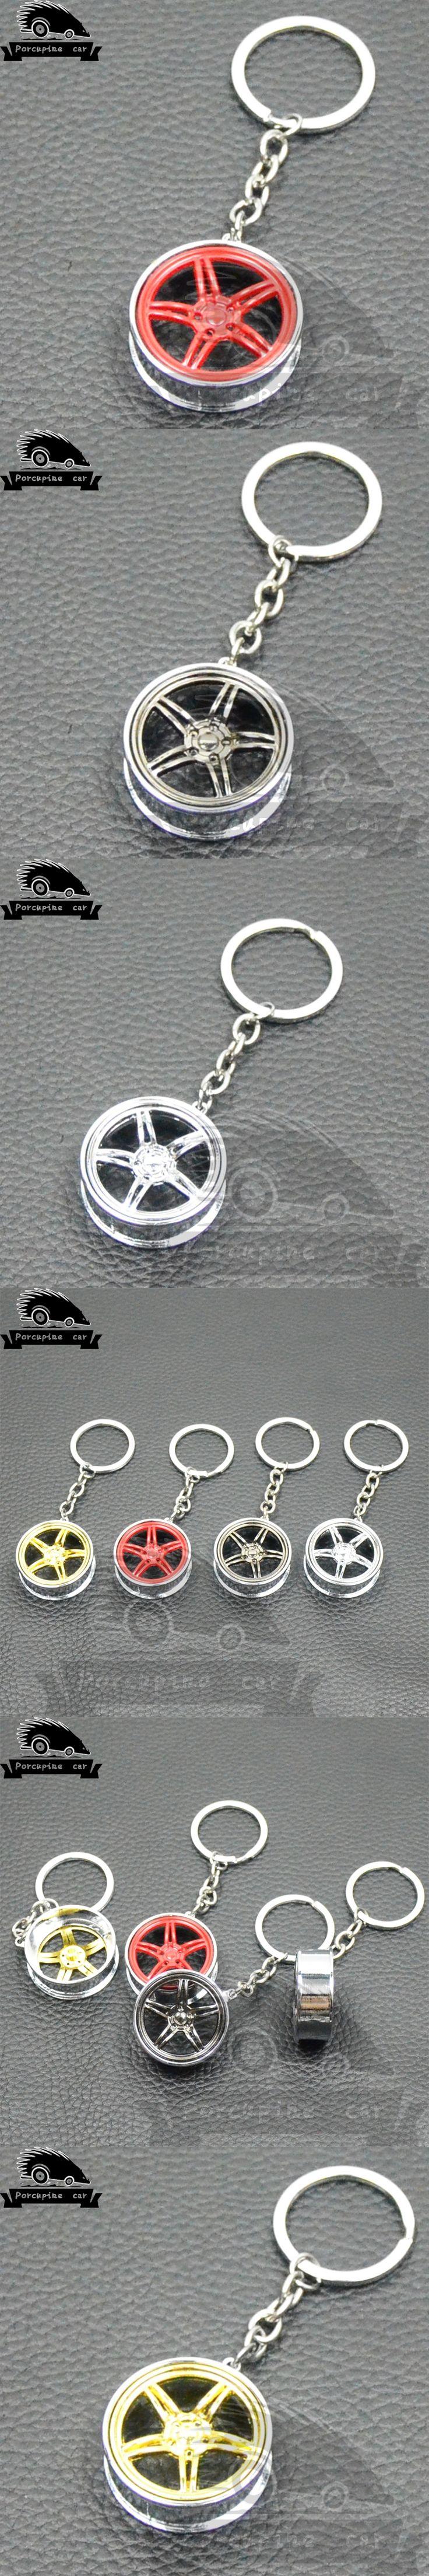 Car Alloy Wholesale Car Key Hot Wheels Keychain Accessories Keychains Wholesale For VW Mercedes Audi BMW Honda